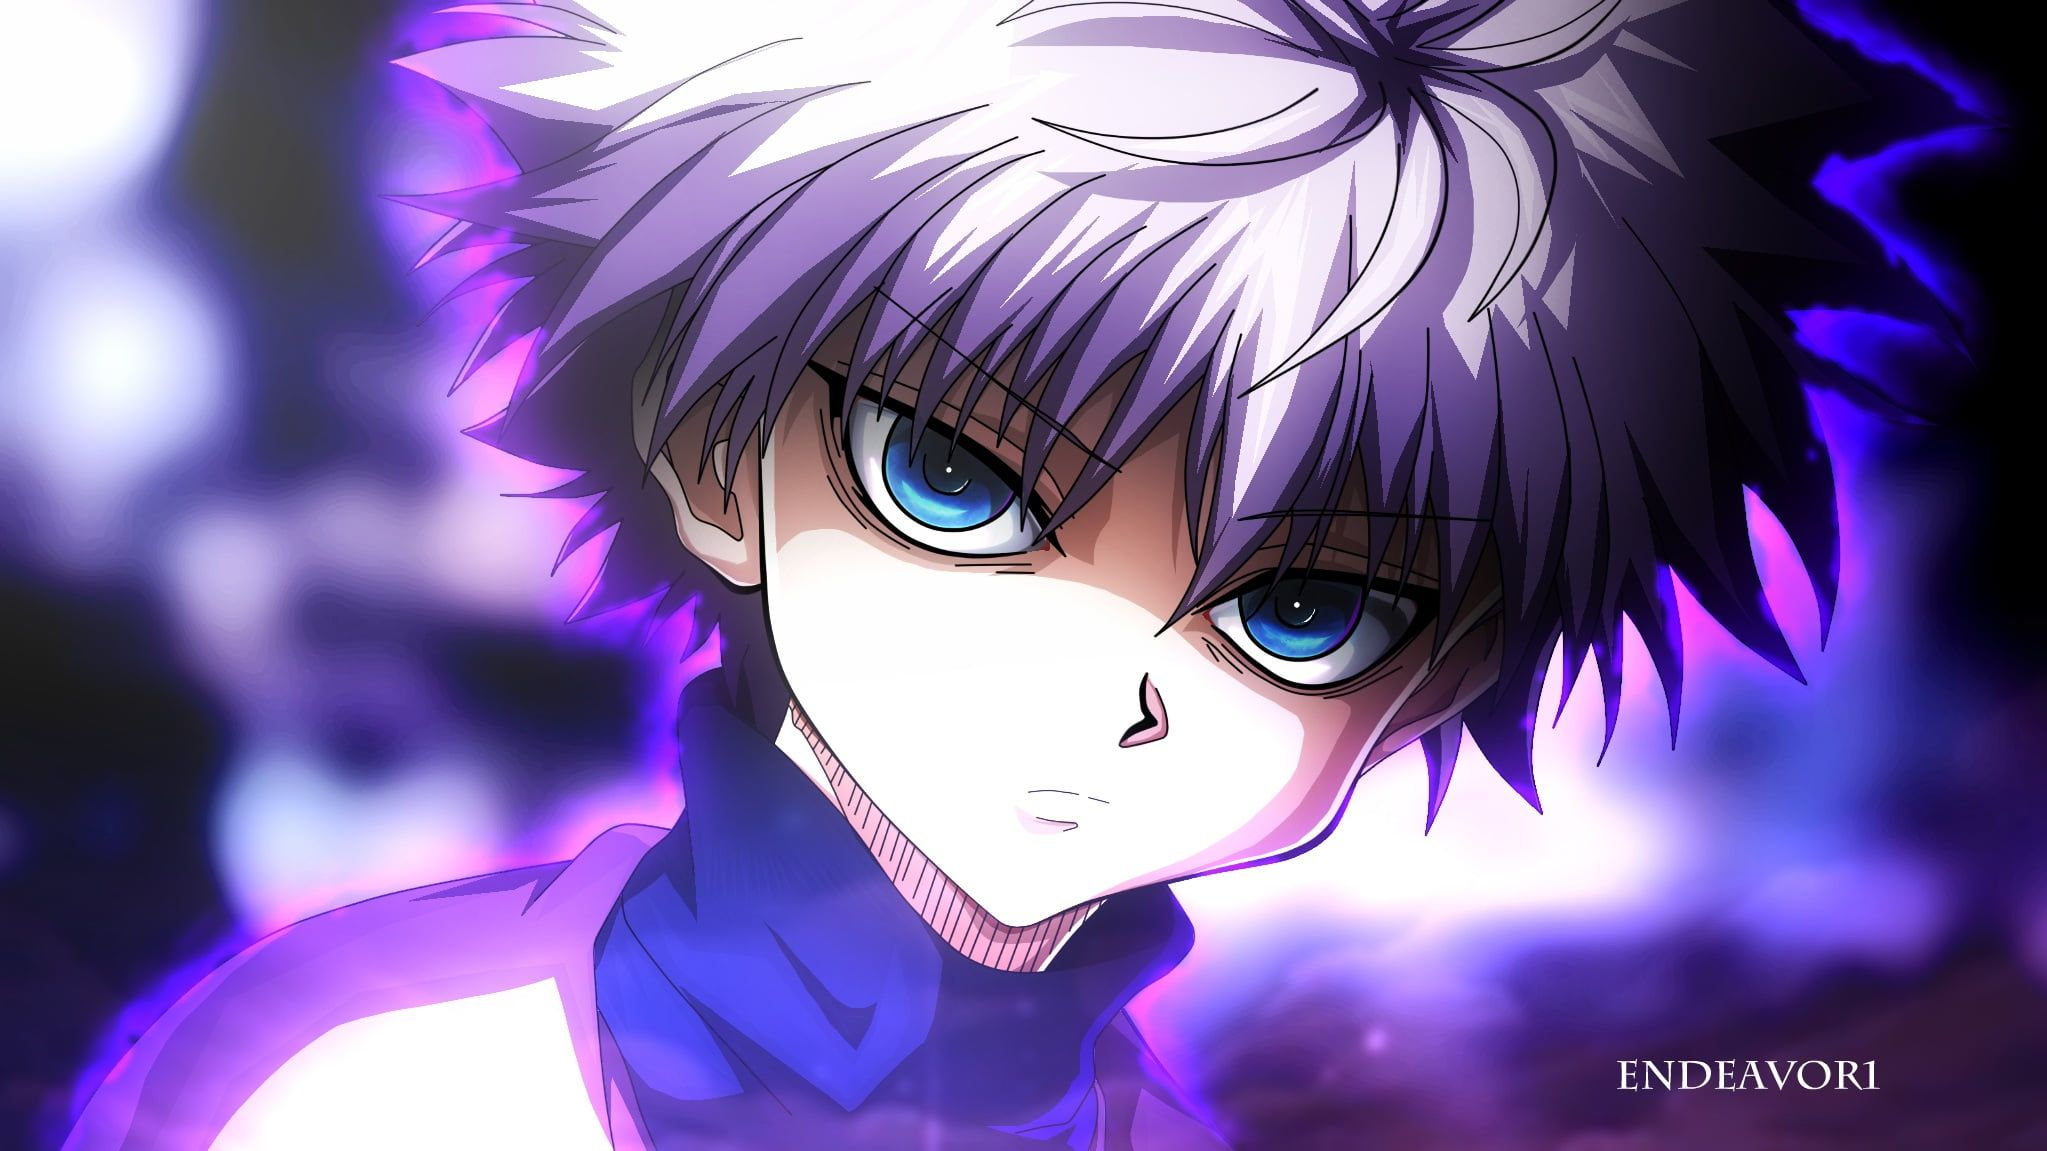 Anime Hunter X Hunter Killua Zoldyck 1080p Wallpaper Hdwallpaper Desktop In 2020 Yandere Manga Killua Hunter X Hunter